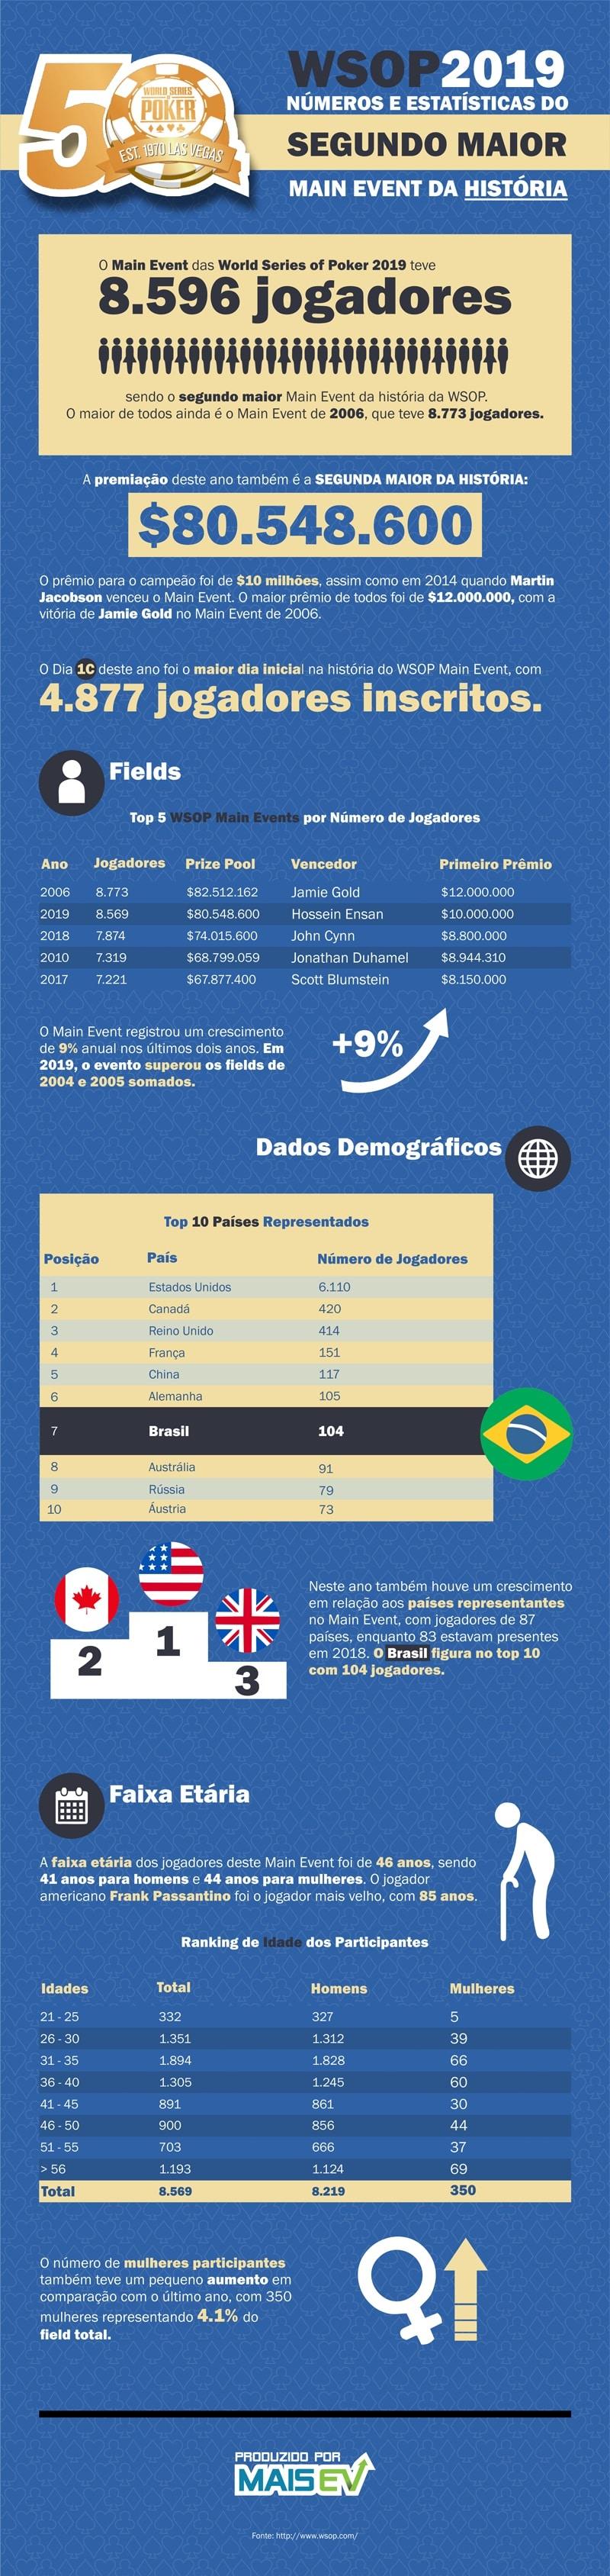 infografico WSOP 50